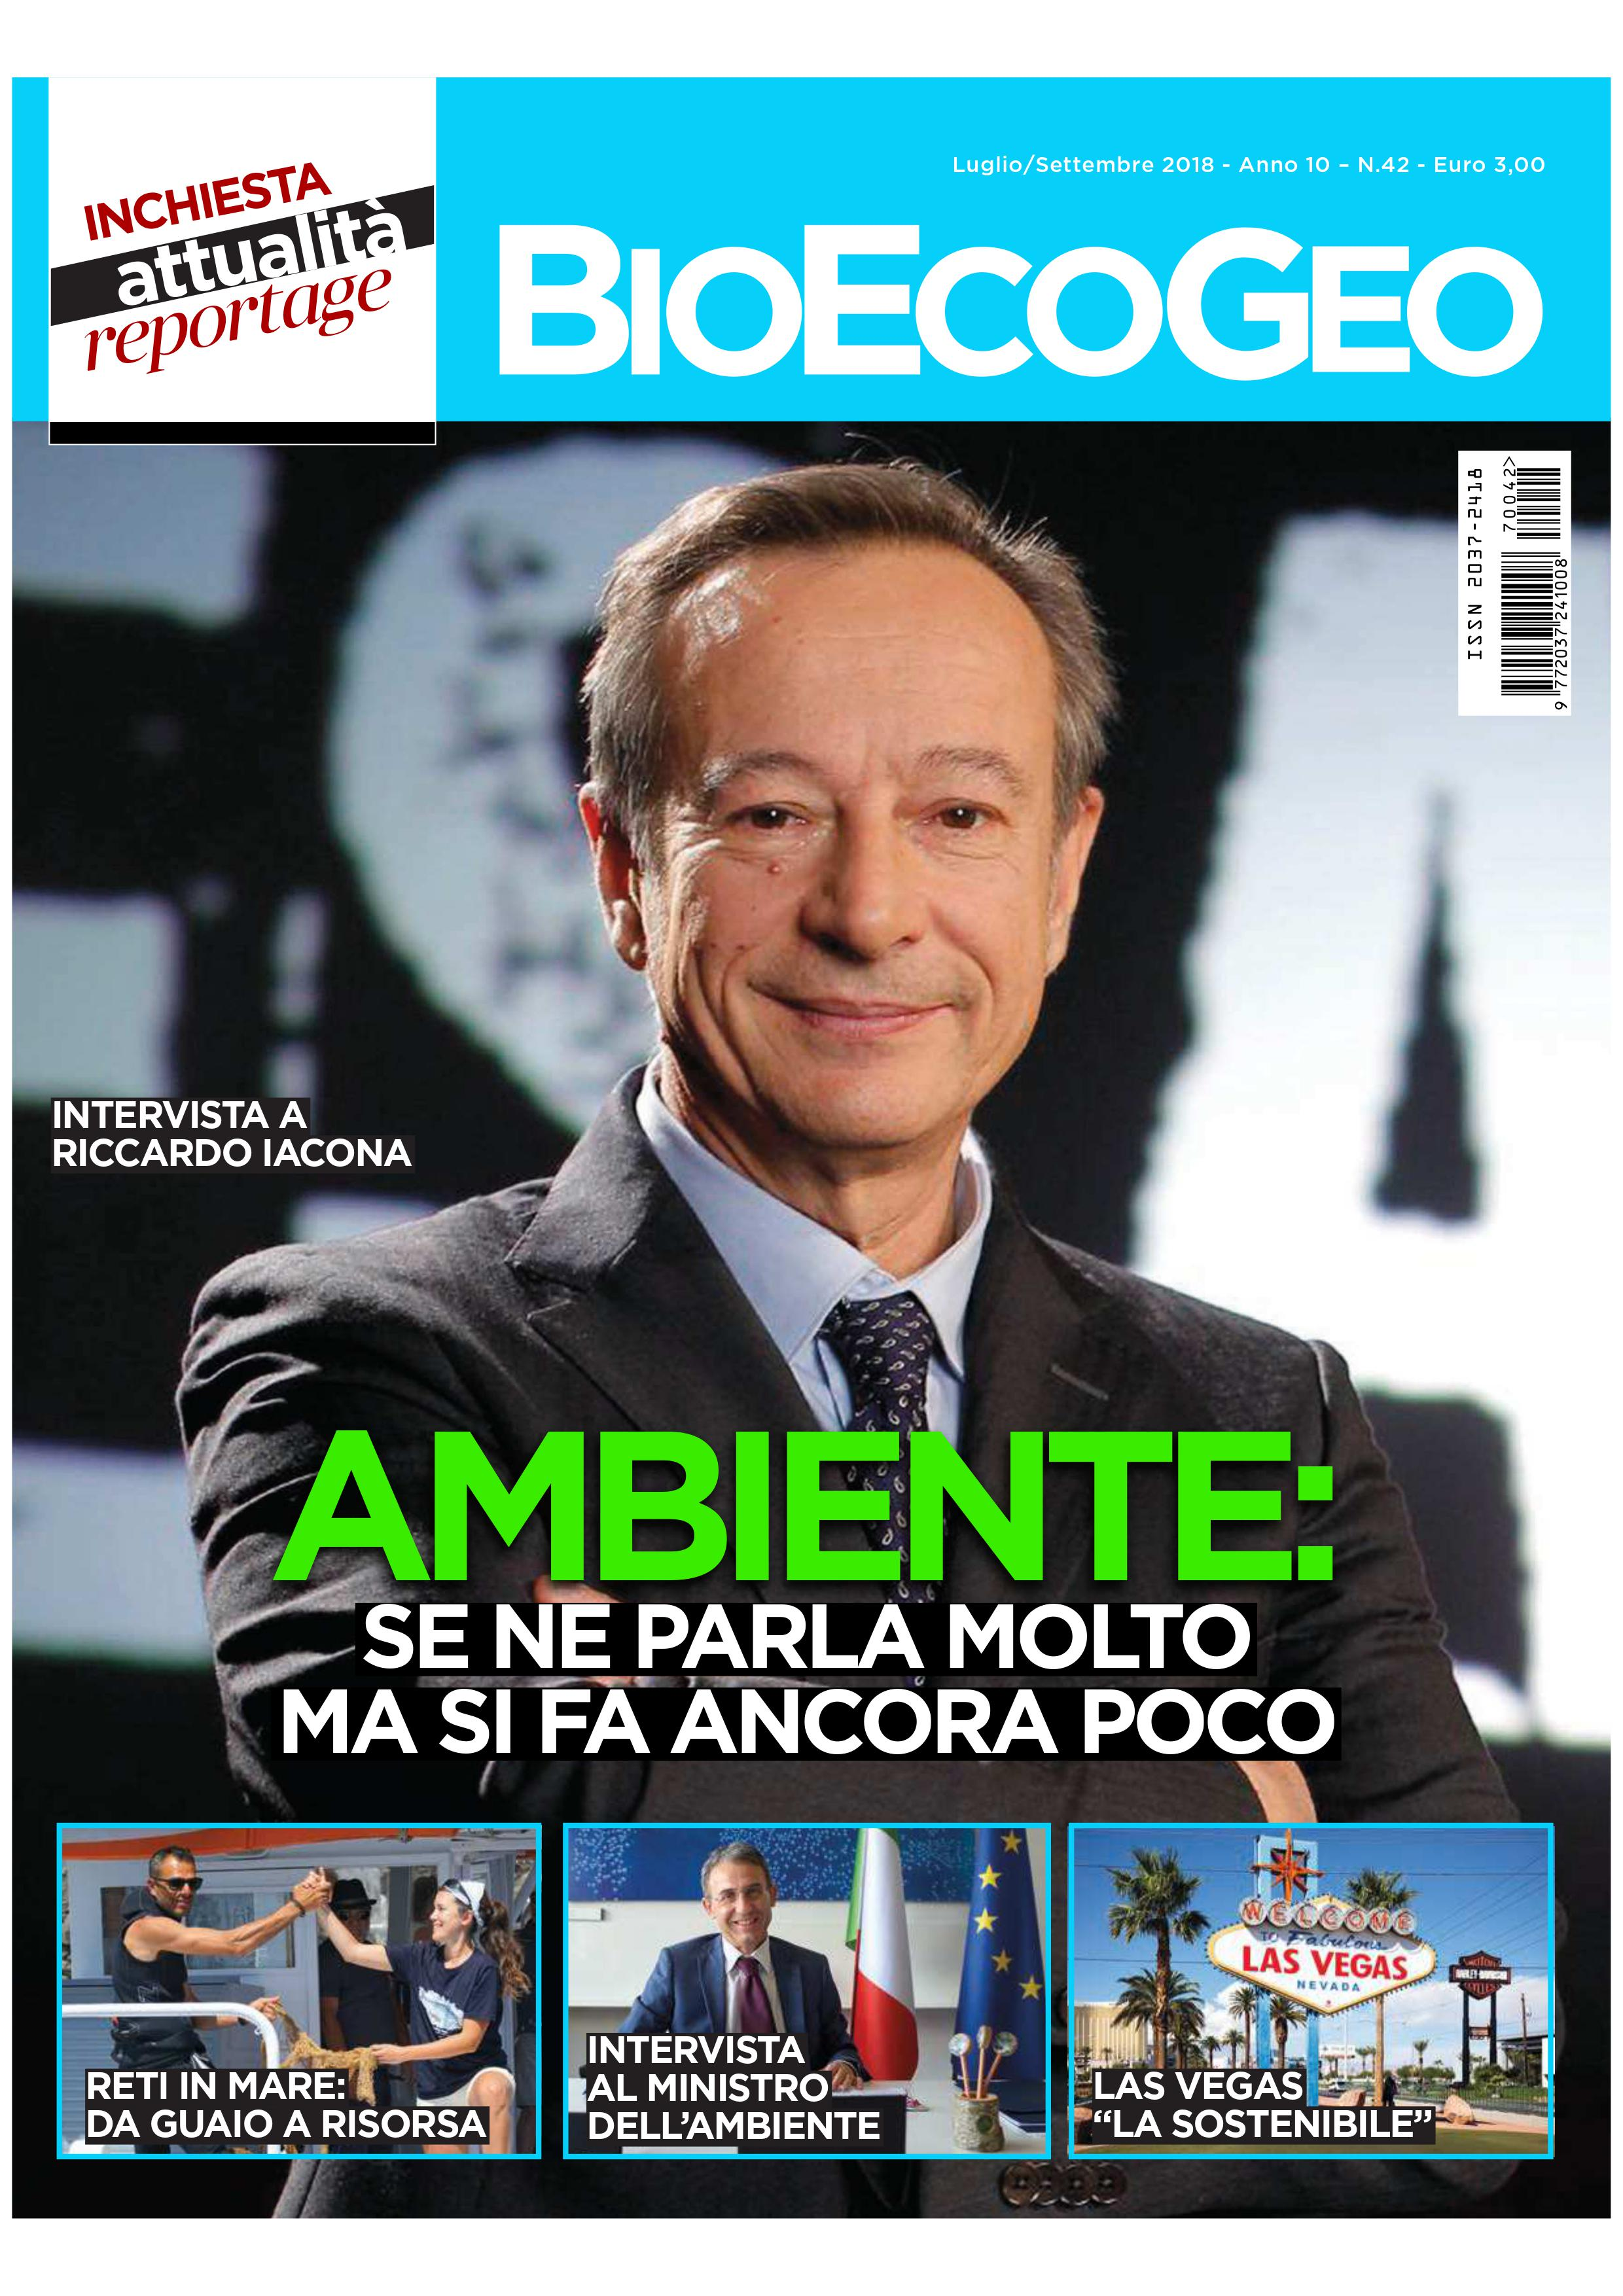 Riccardo Iacona Intervista